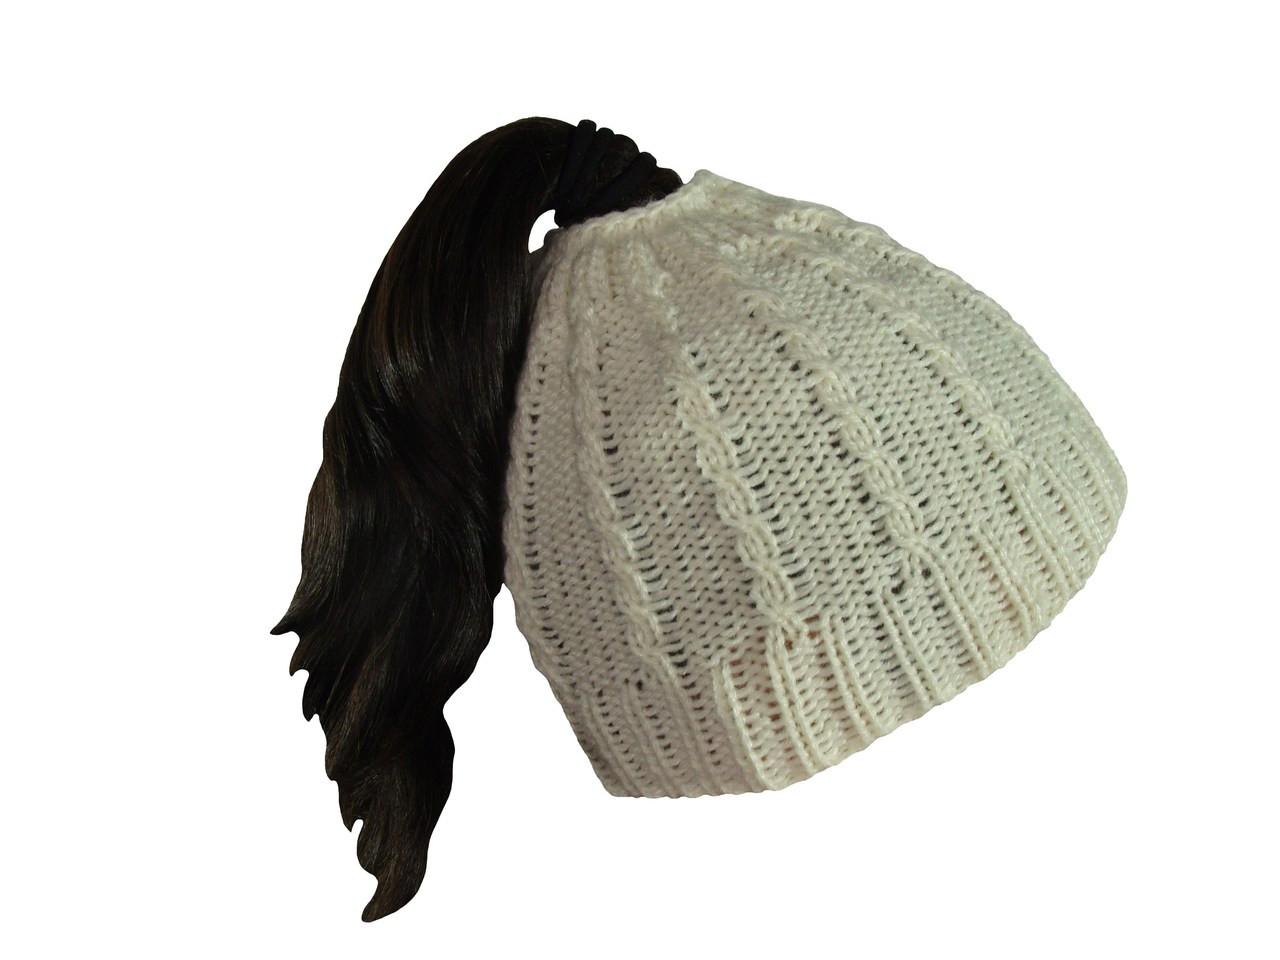 e19b846697639 Crochet Beanie 100% Alpaca Messy Bun or High Ponytail Look Chilly Days ...